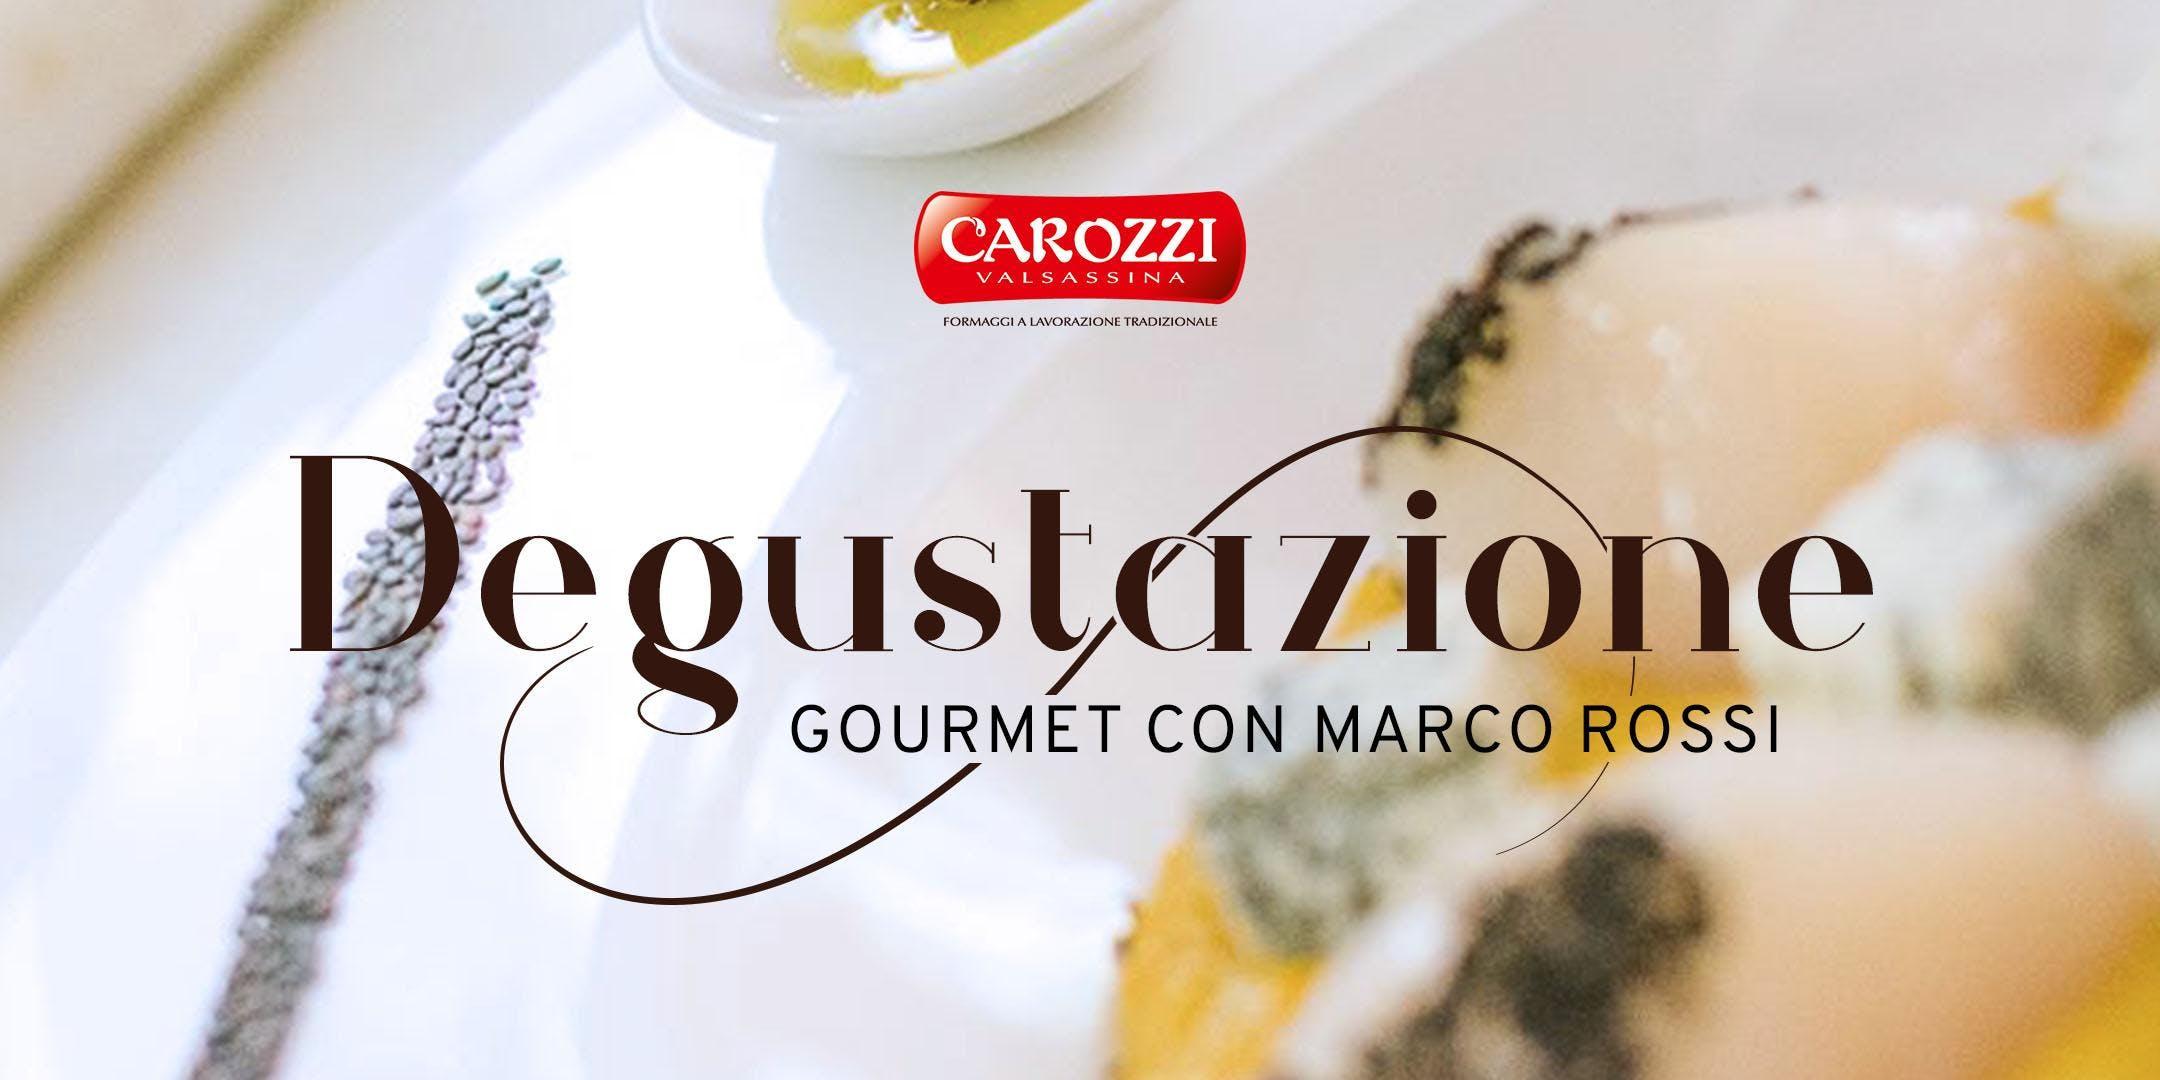 Degustazione Gourmet Marco Rossi